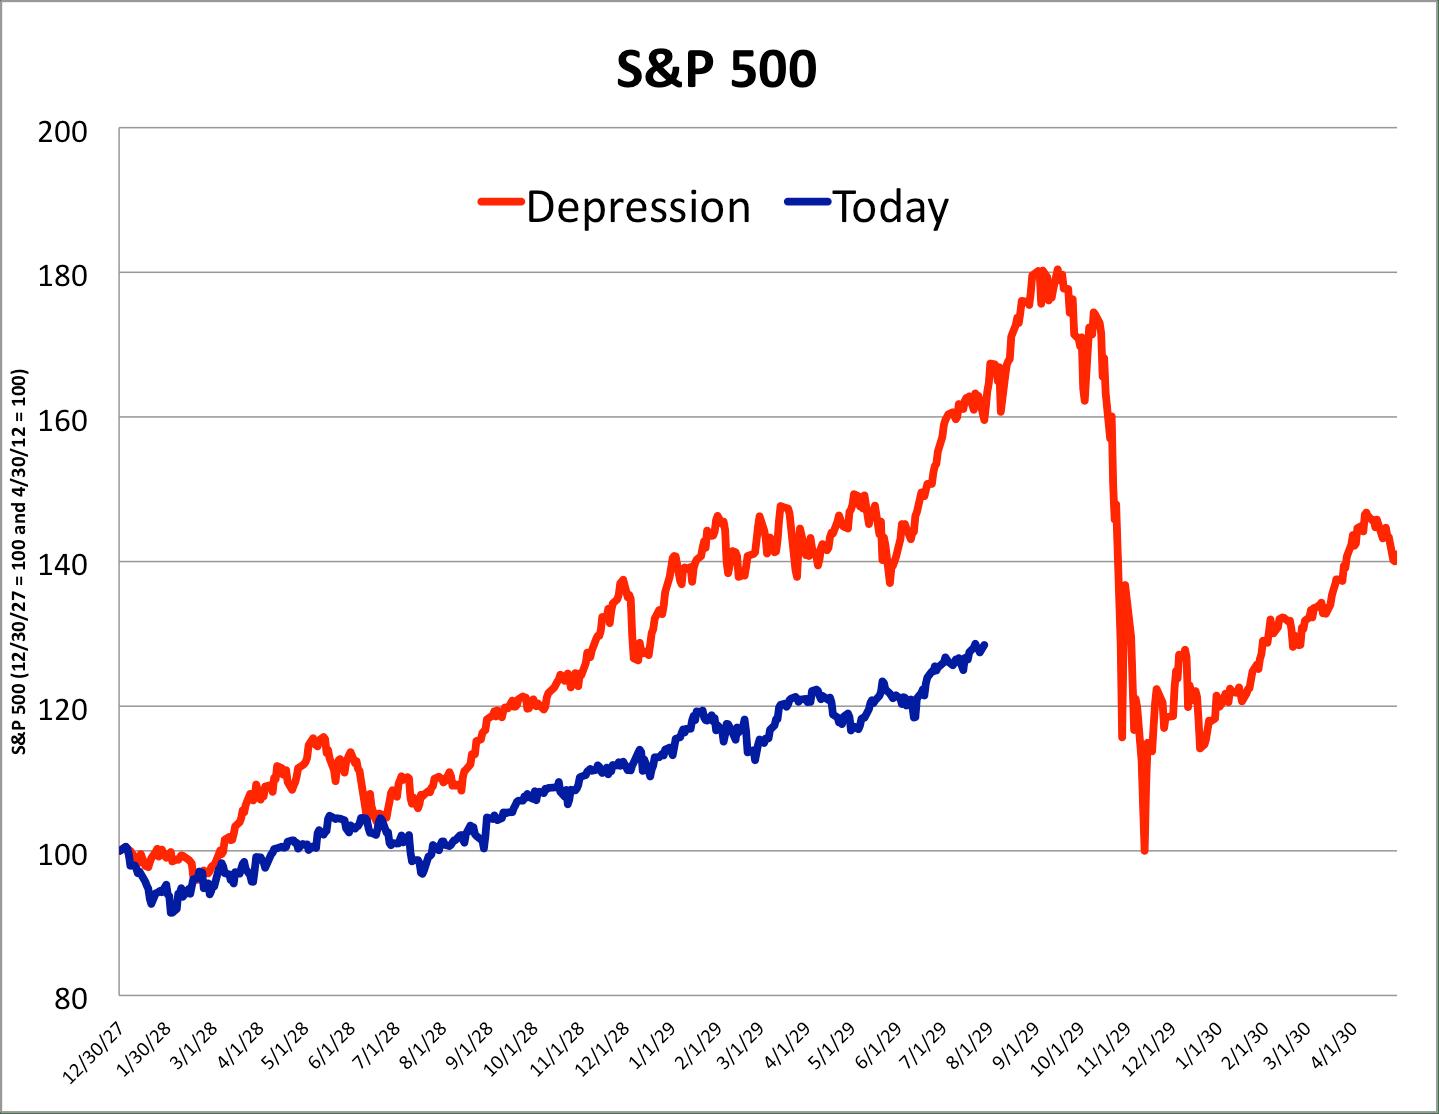 Yst Destroys The Stock Market Crash Chart That Wall